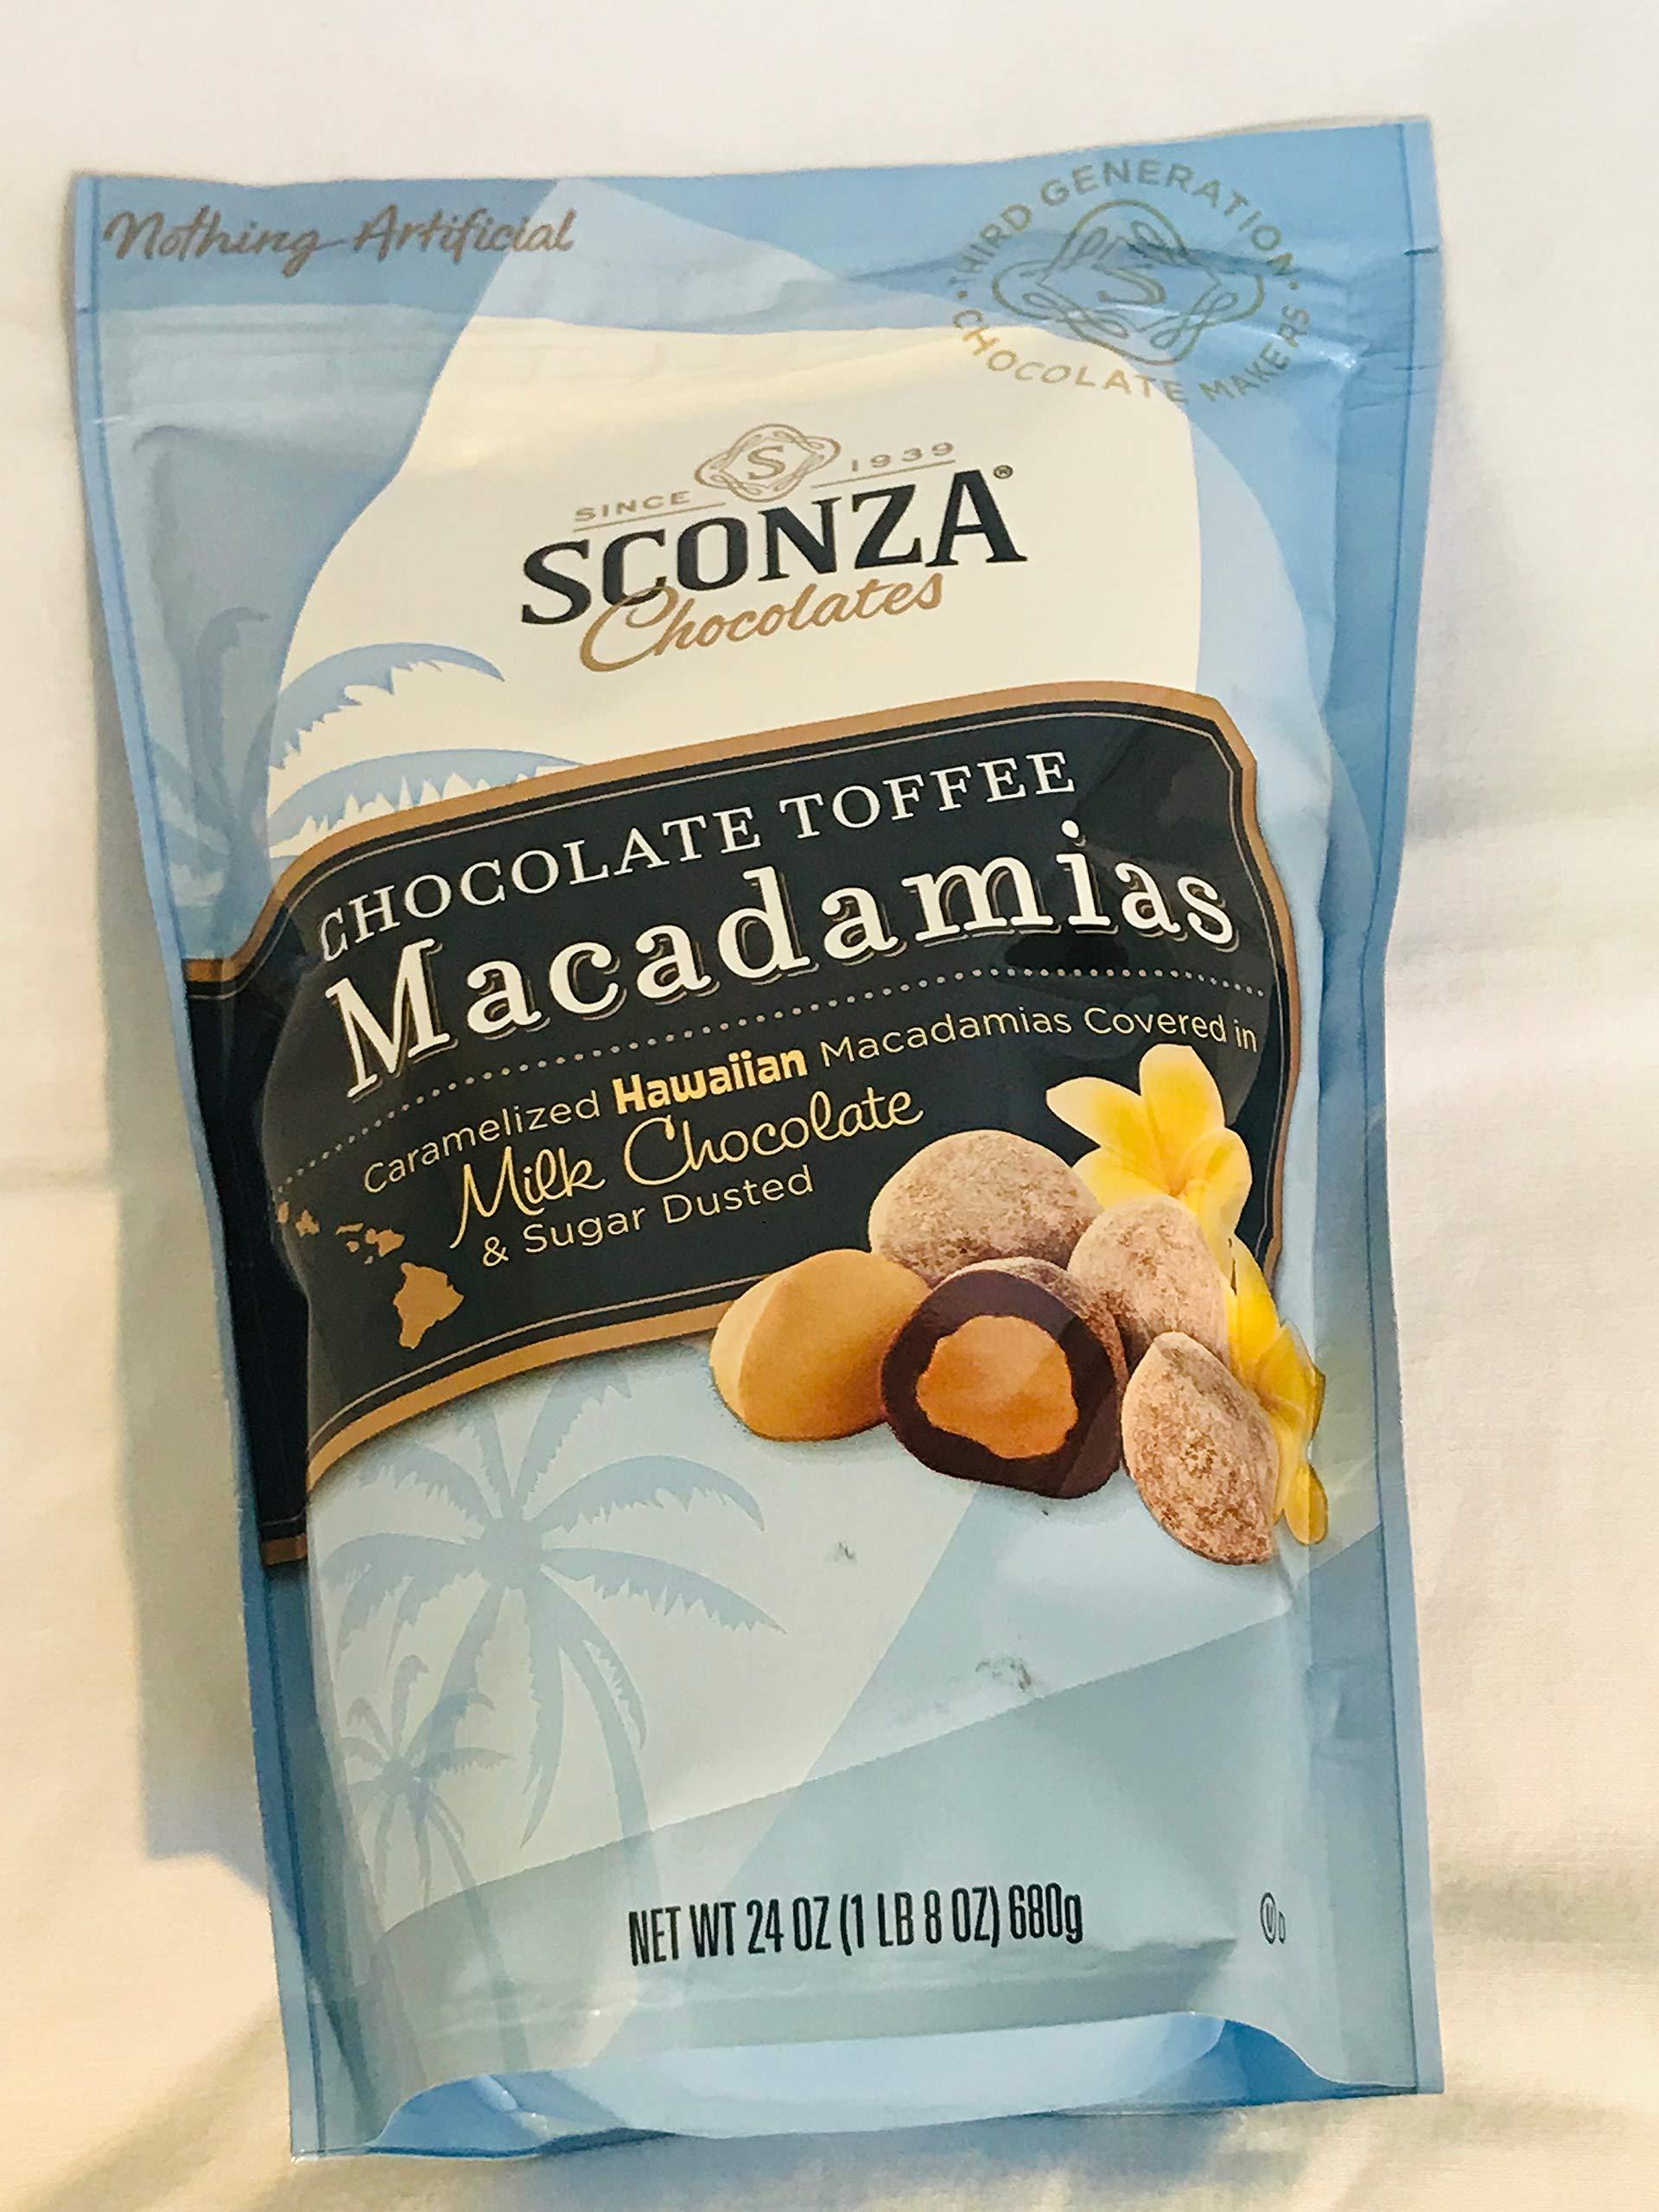 Sconza Chocolate Toffee Macadamias